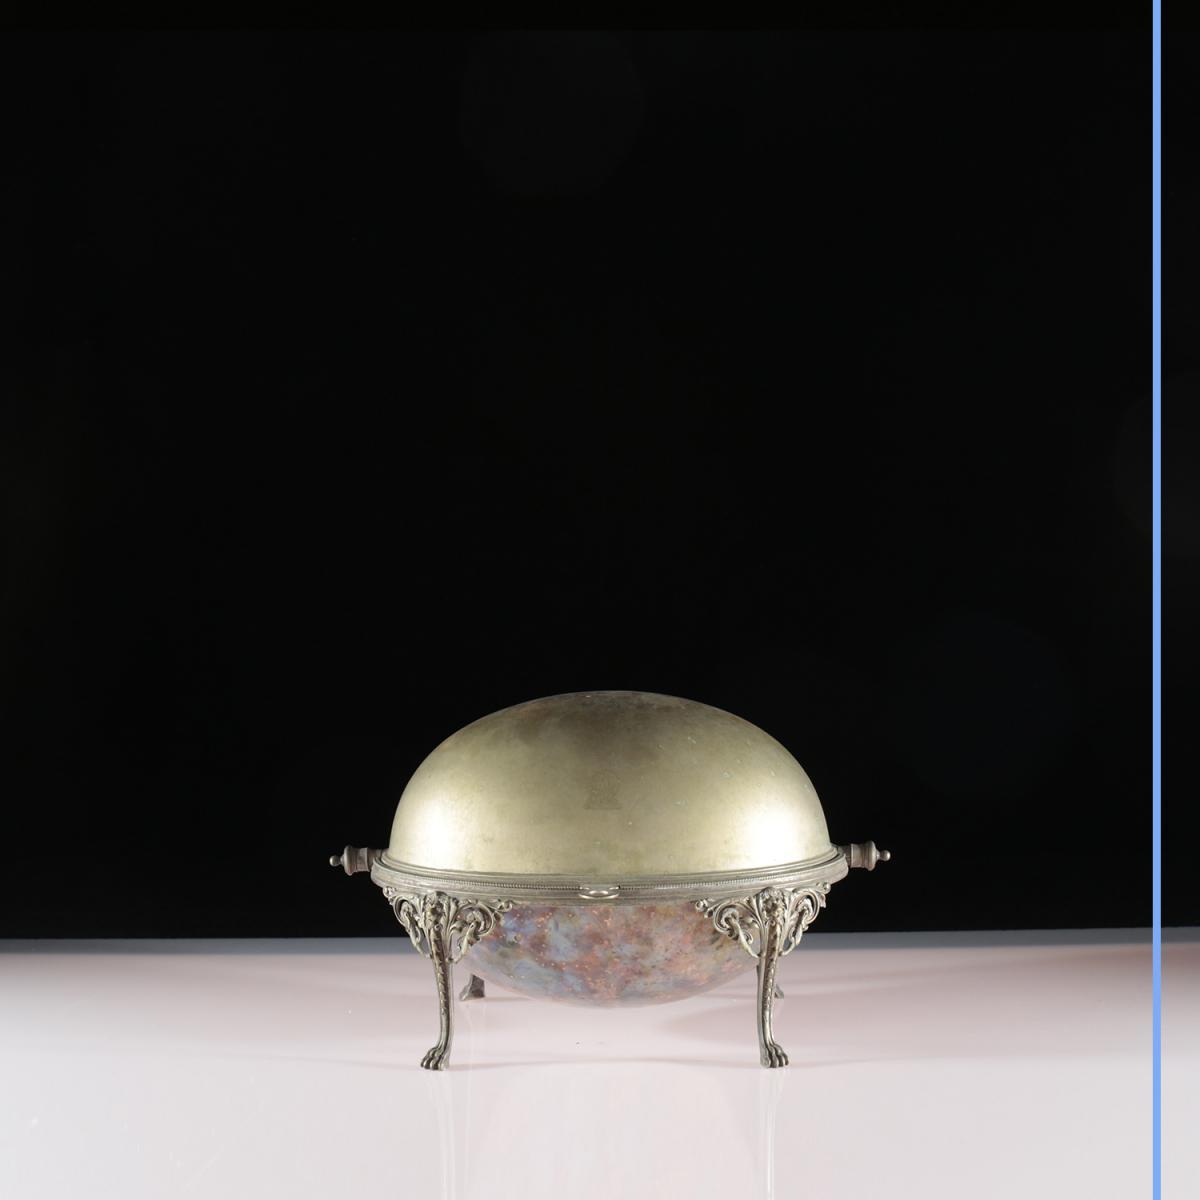 Chauffe-plat à cloche en argent, XIXe